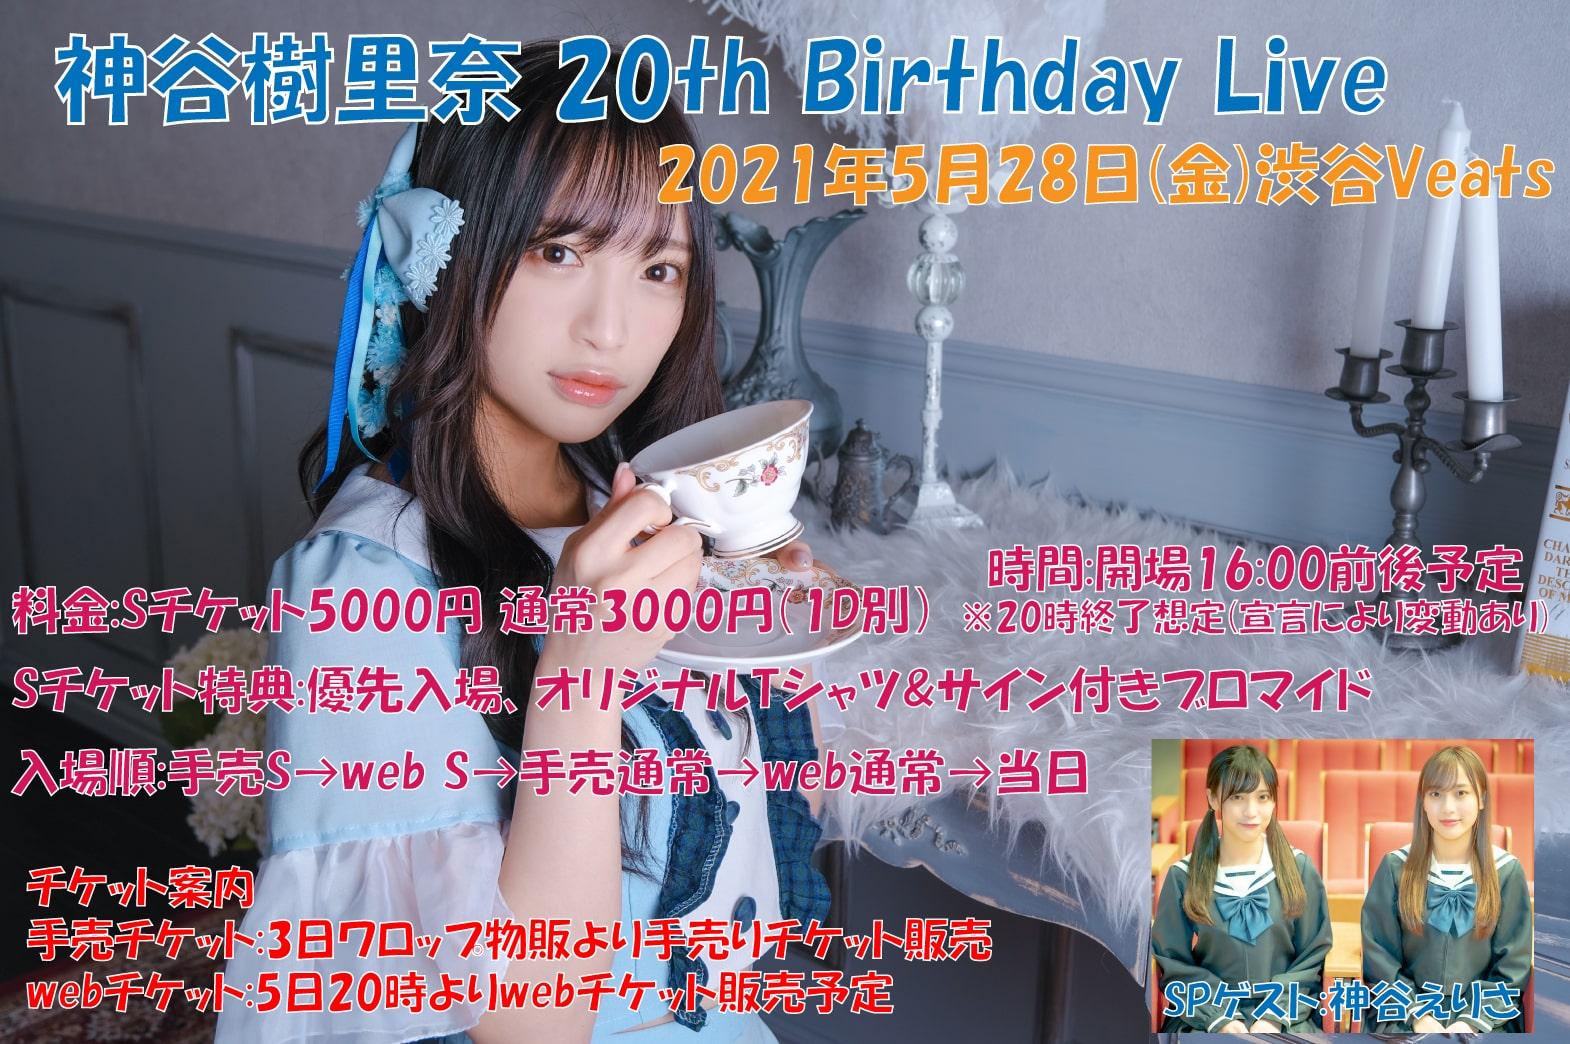 神谷樹里奈 20th Birthday Live